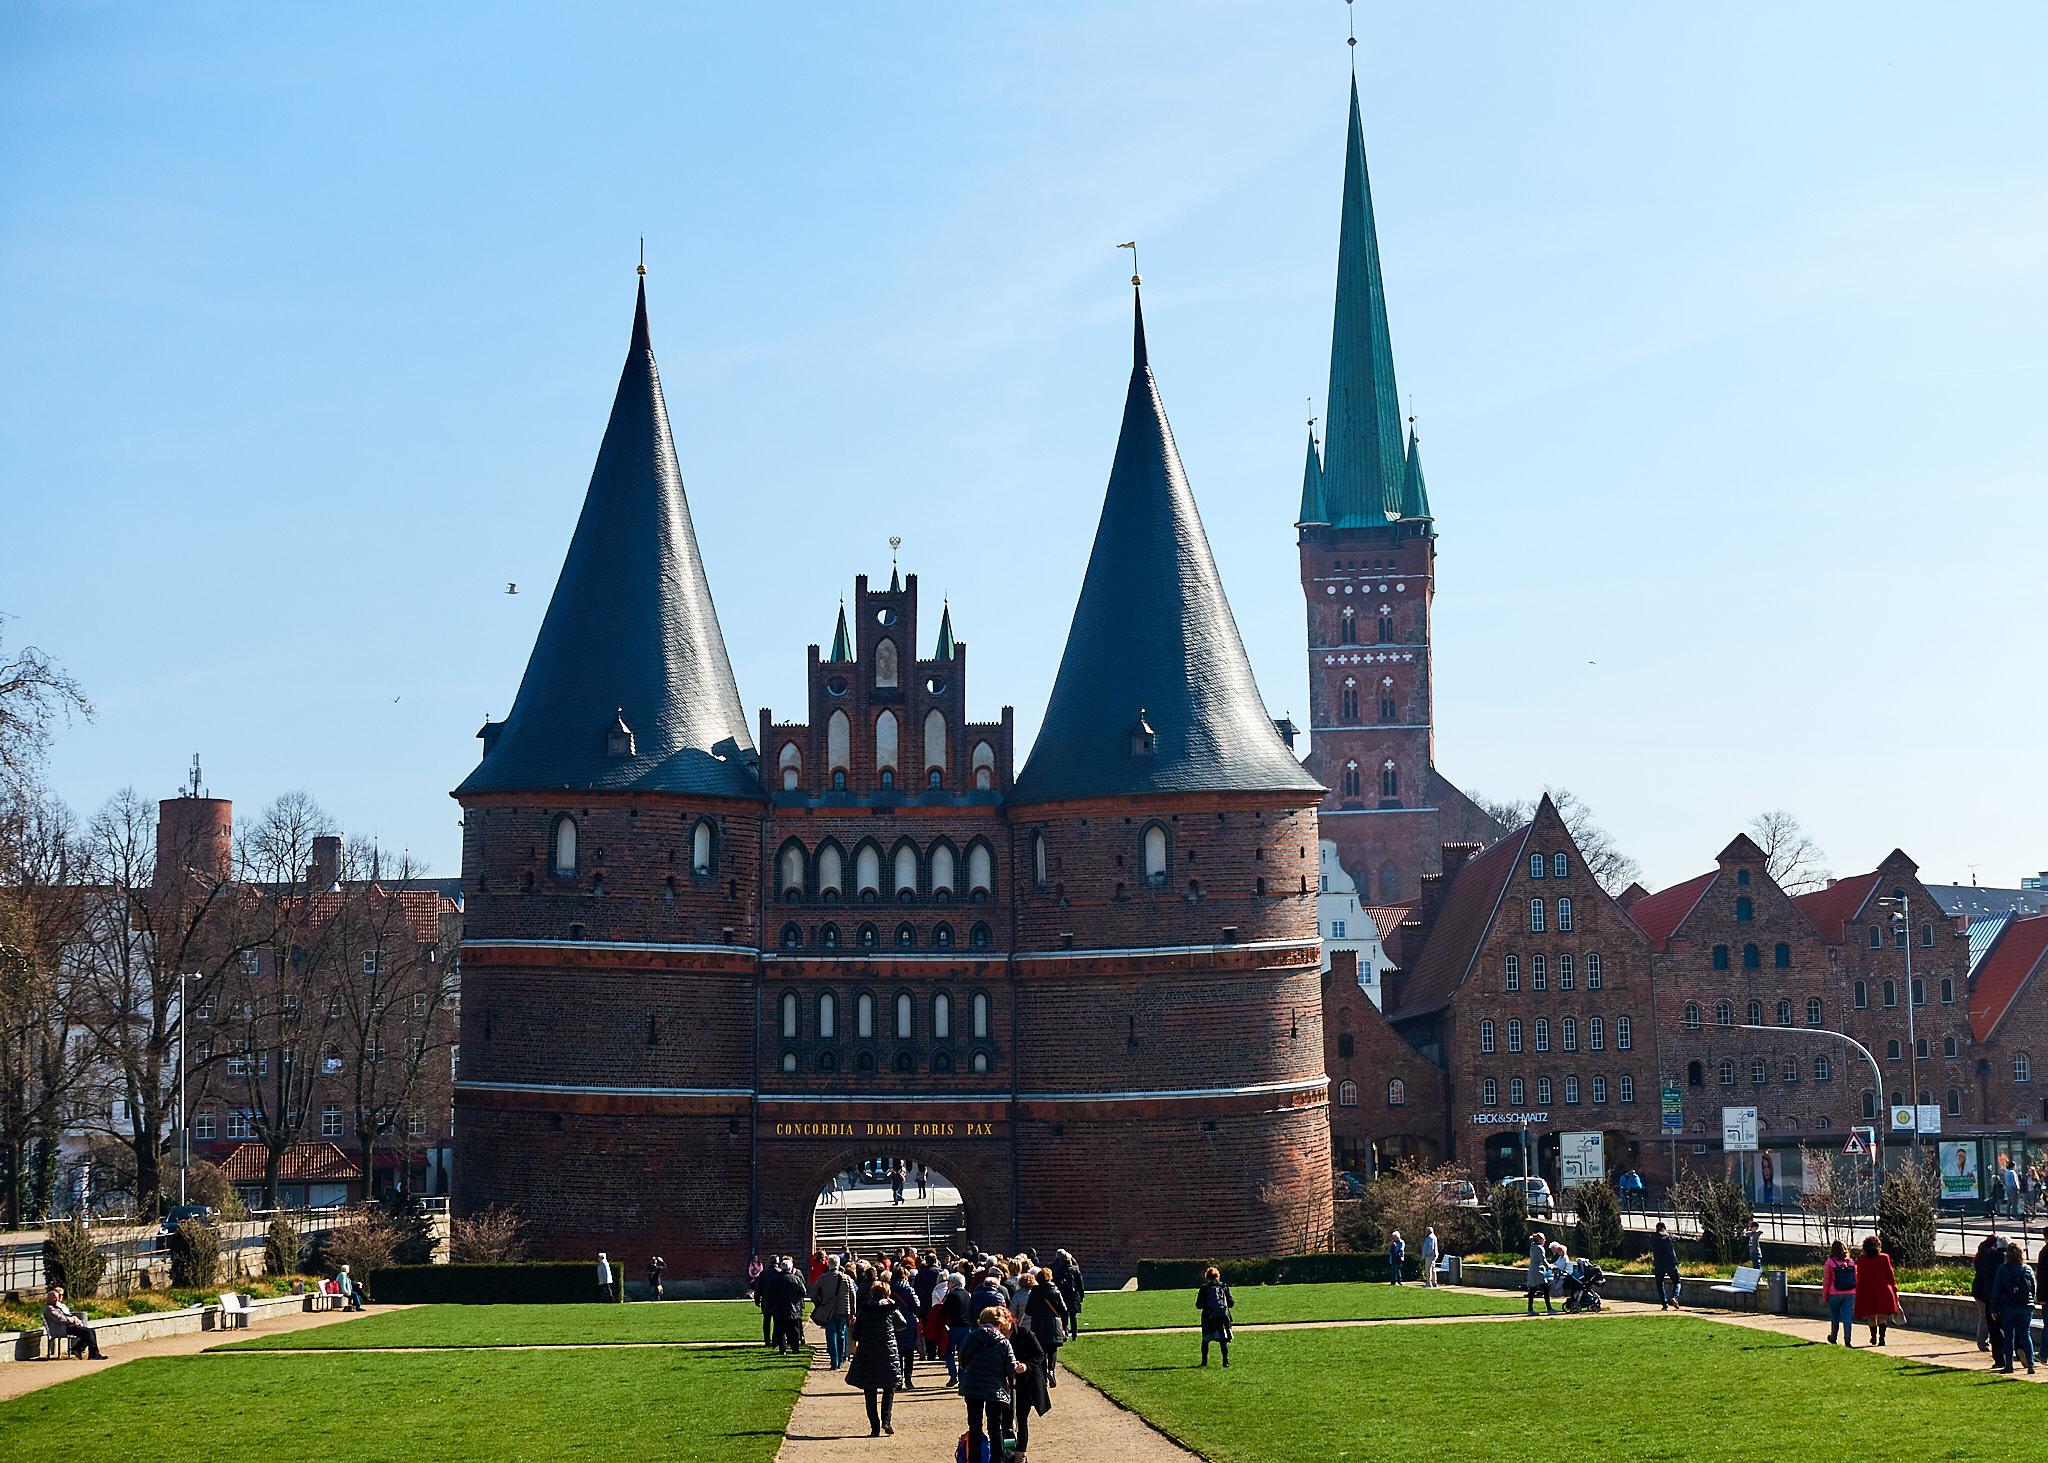 20190330-Lübeck-293.jpg